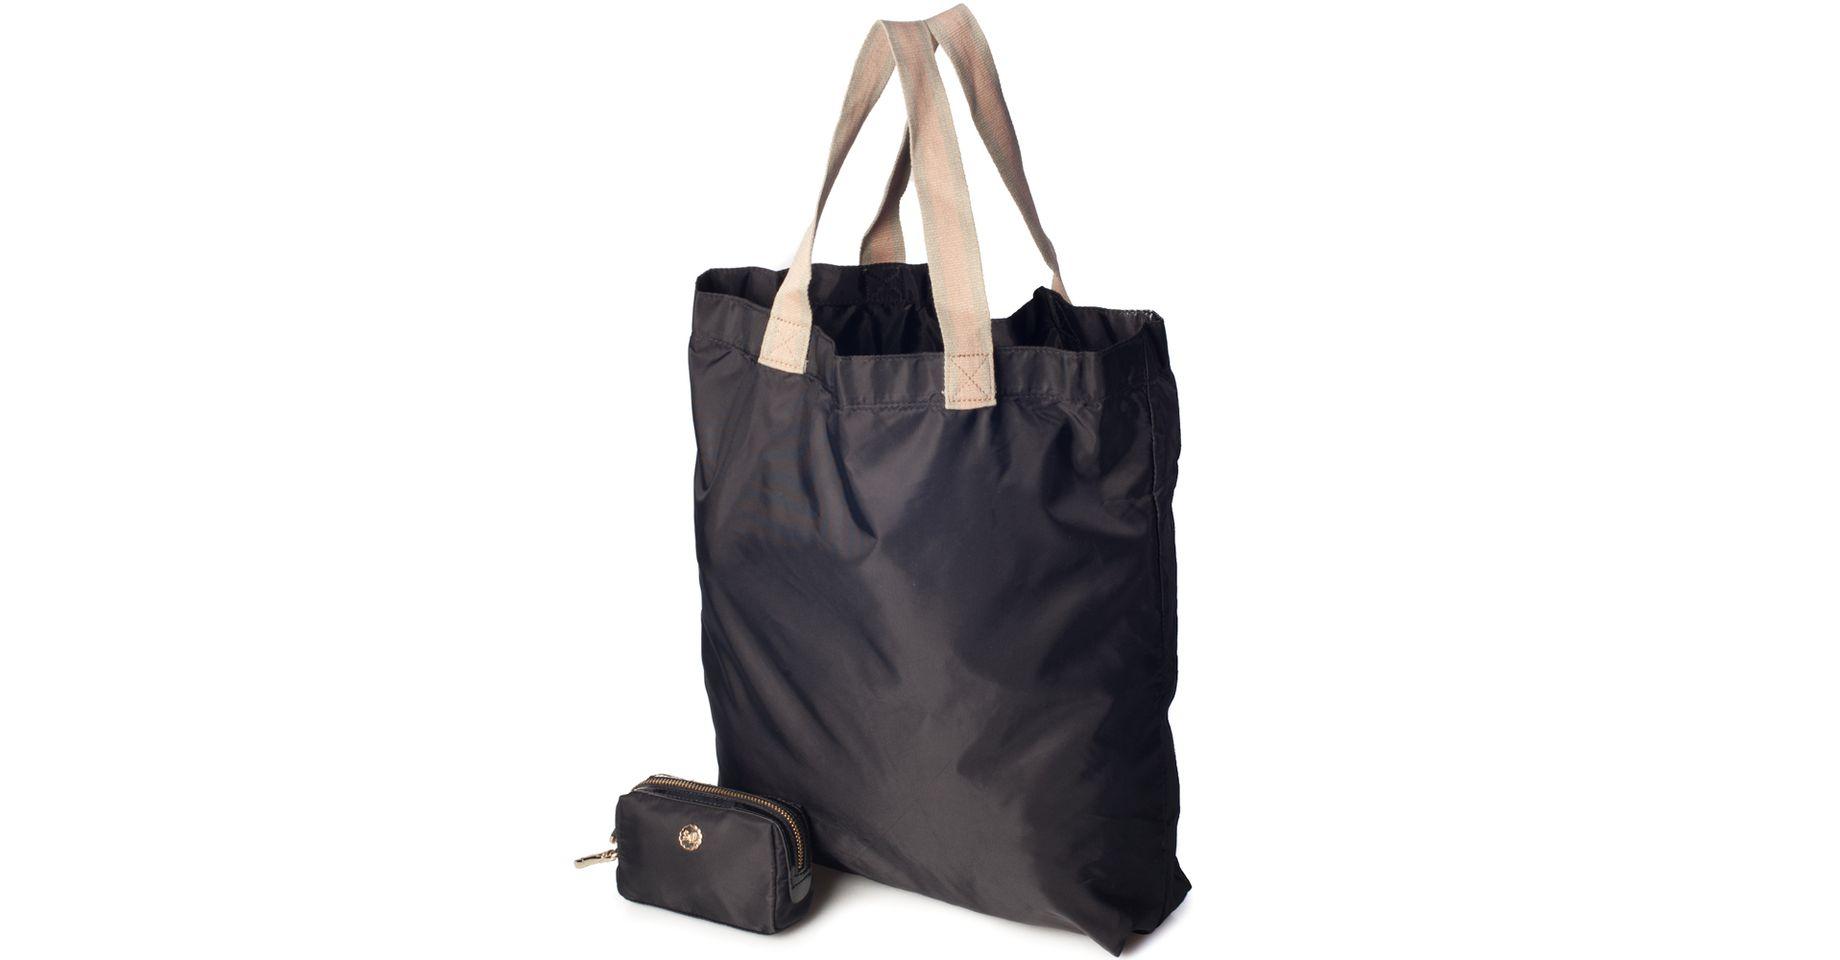 020104002_204_2-SHOPPING-BAG-RAFAELA